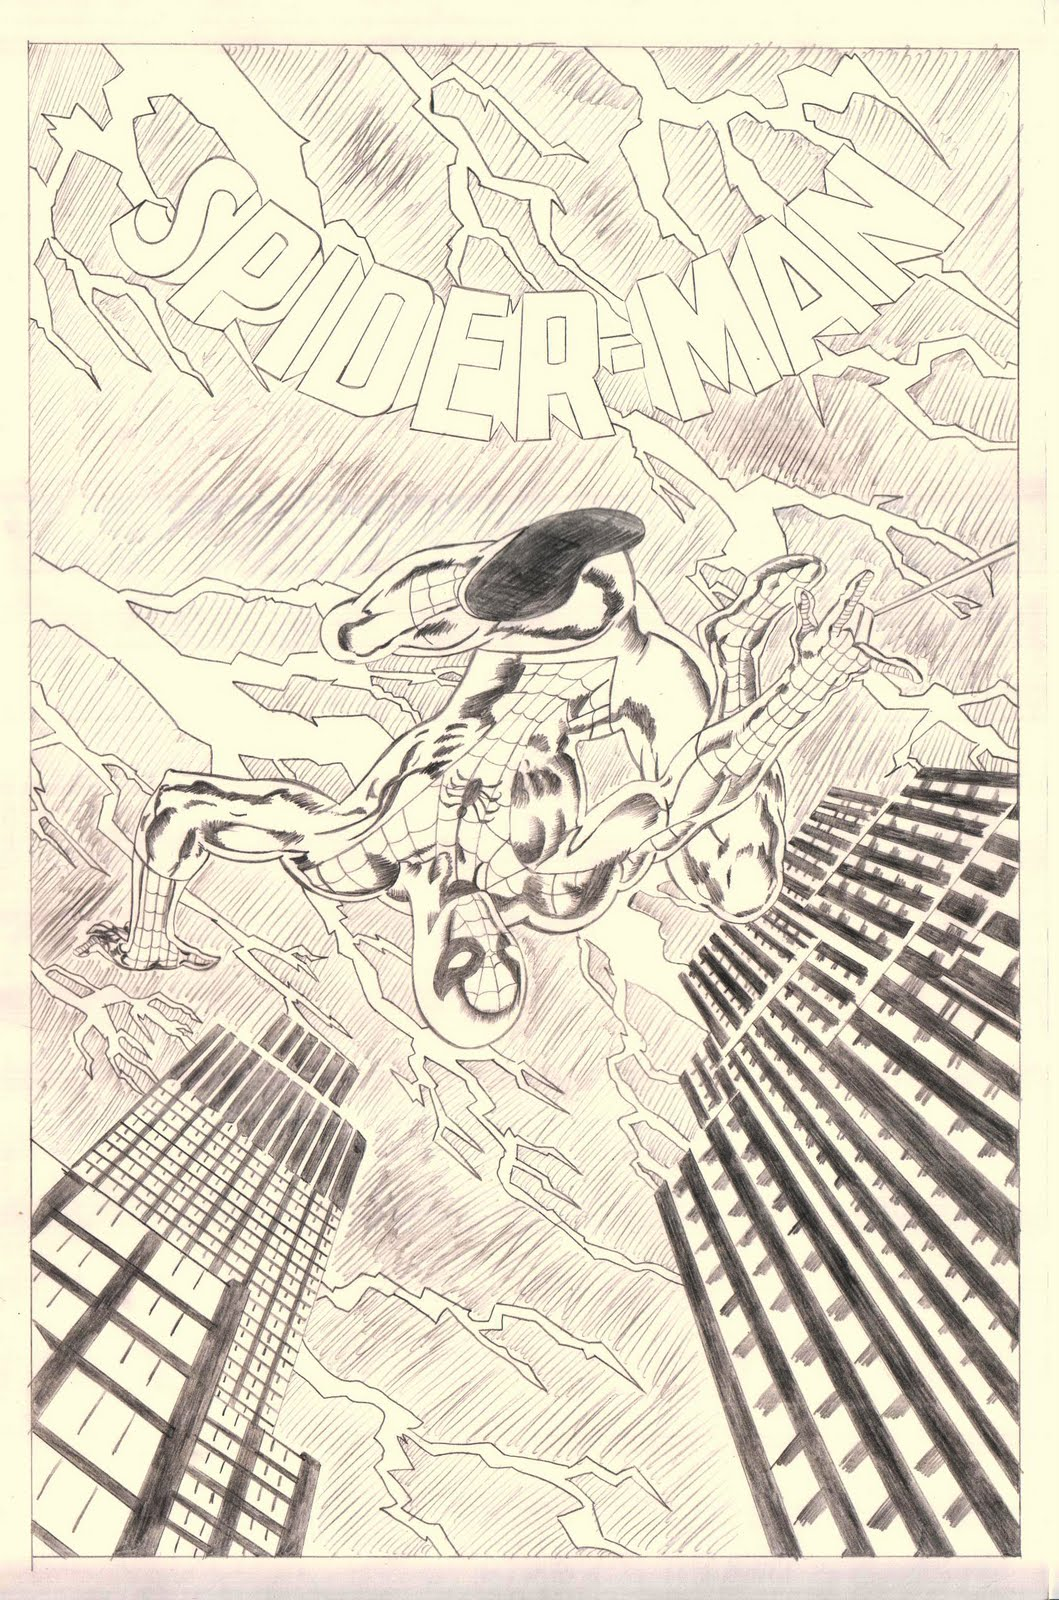 Original Comic Book Cover Art : Spider man original art cover recreation comic book